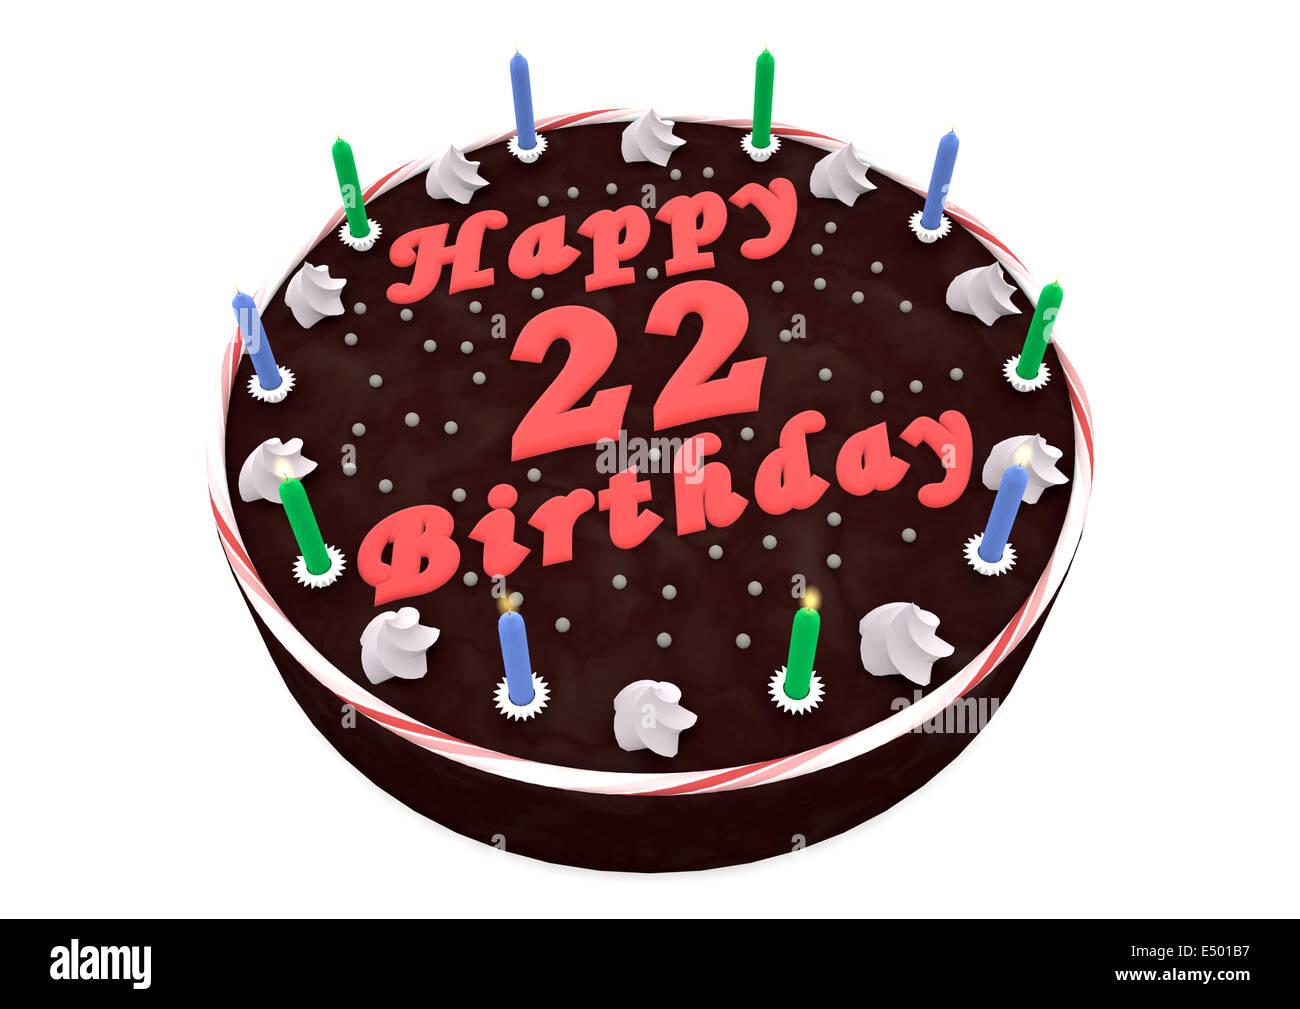 Chocolate Cake For 22th Birthday